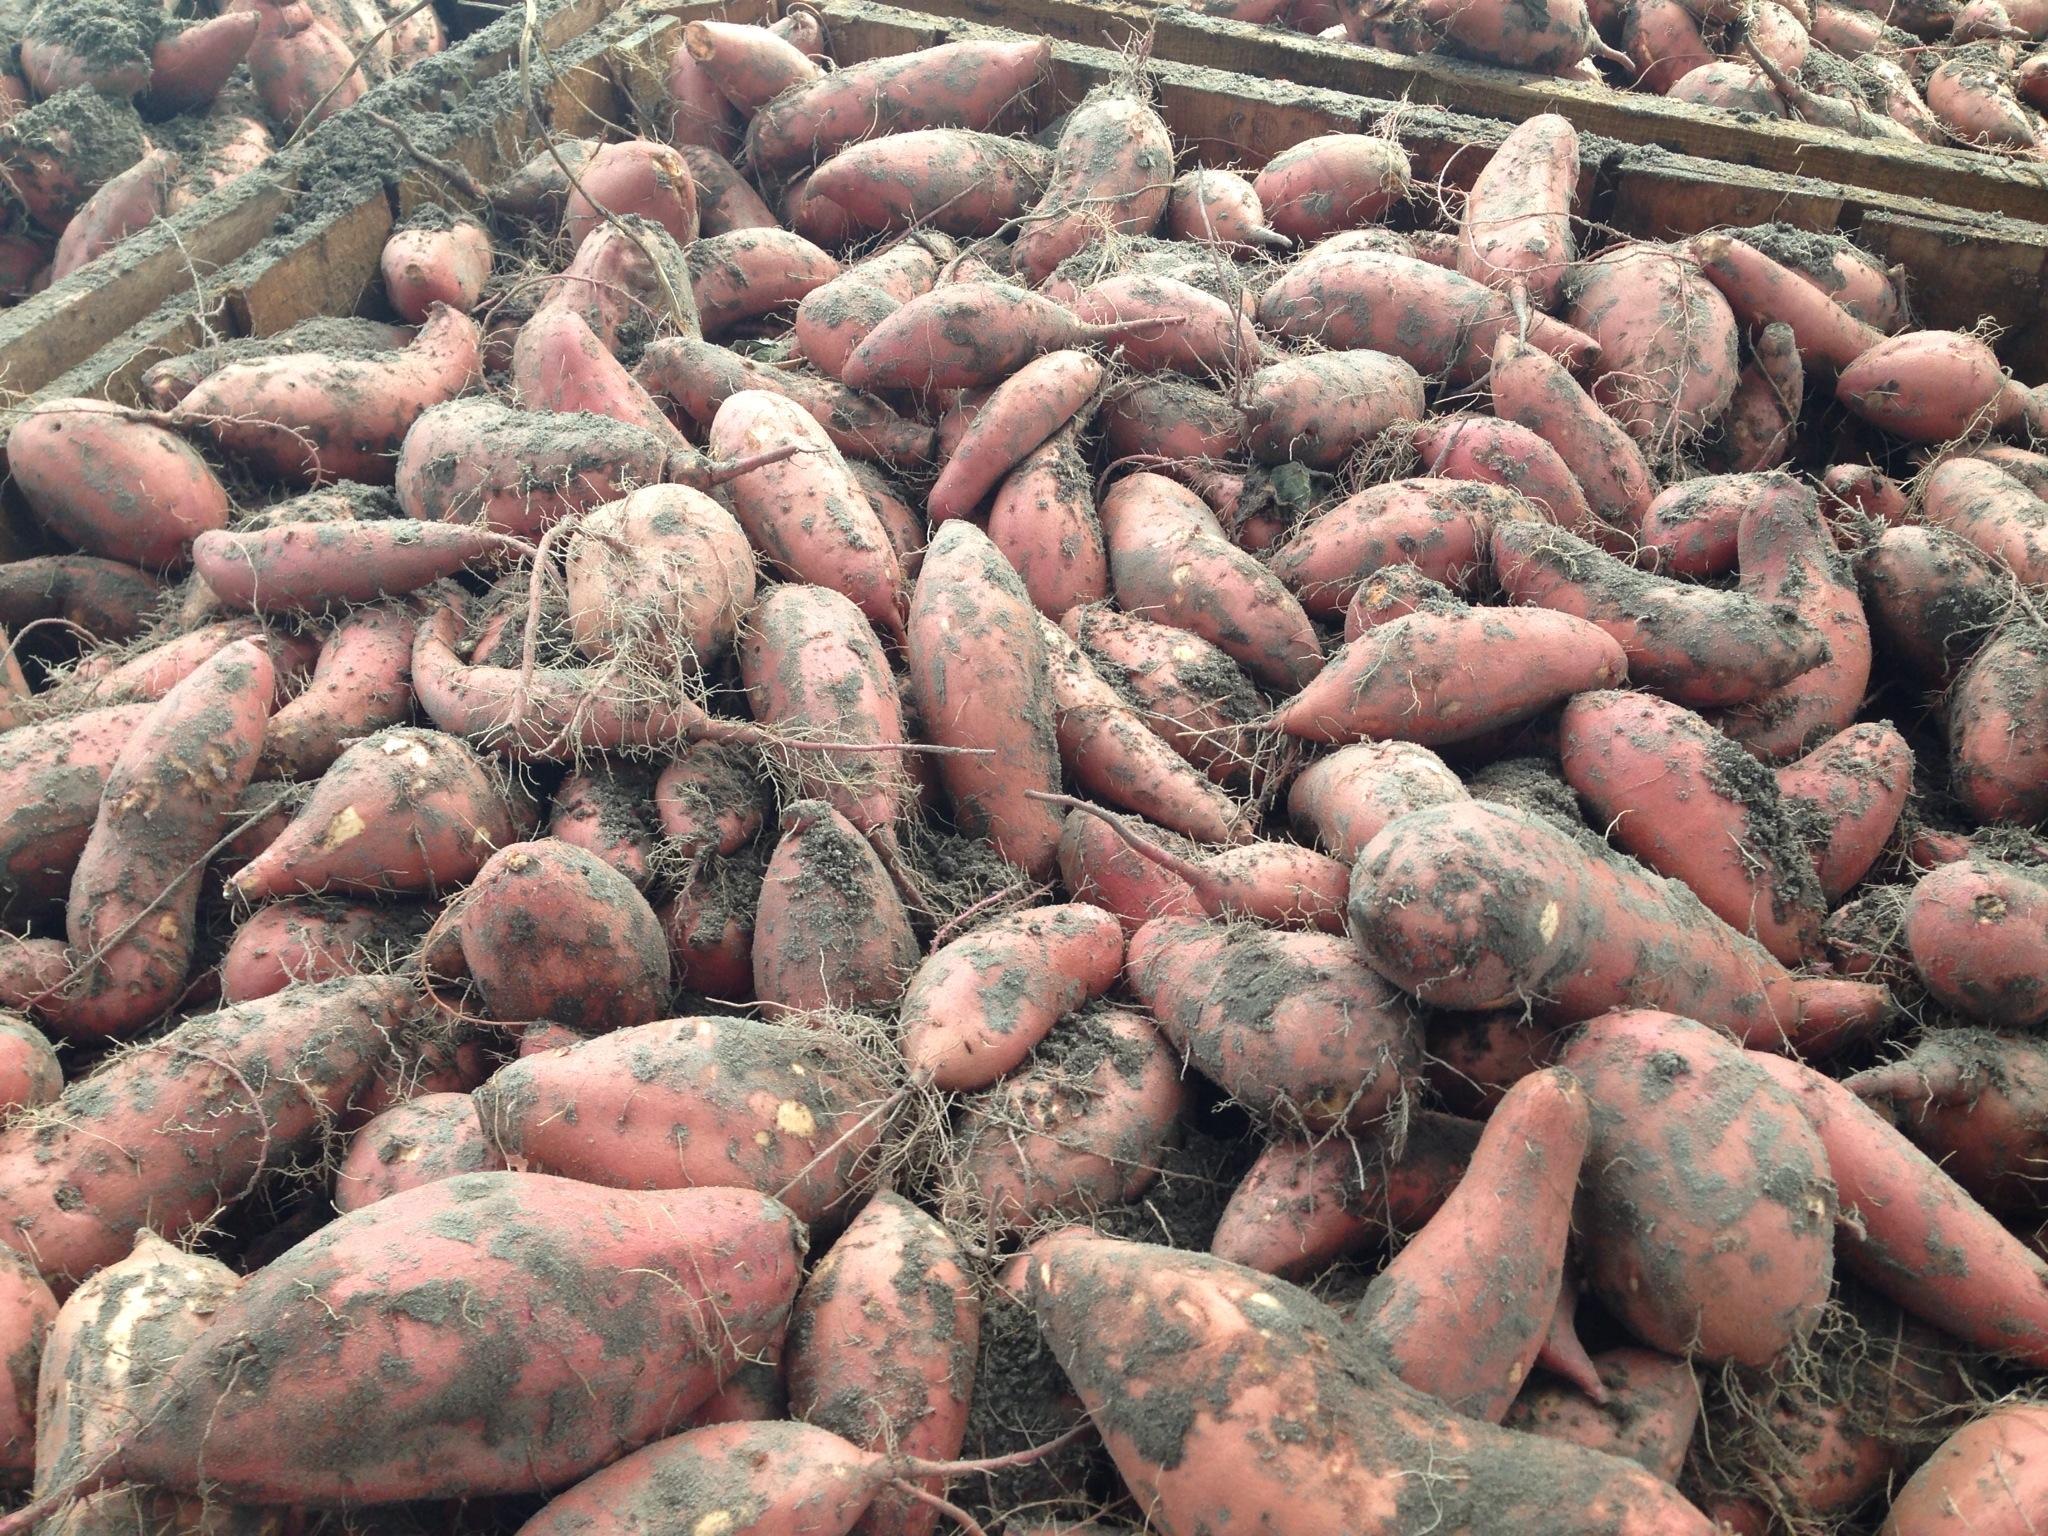 Townsend Farms' (Live Oak, FL)sweet potatoes dug in 2013 using the Standen TSP1900.